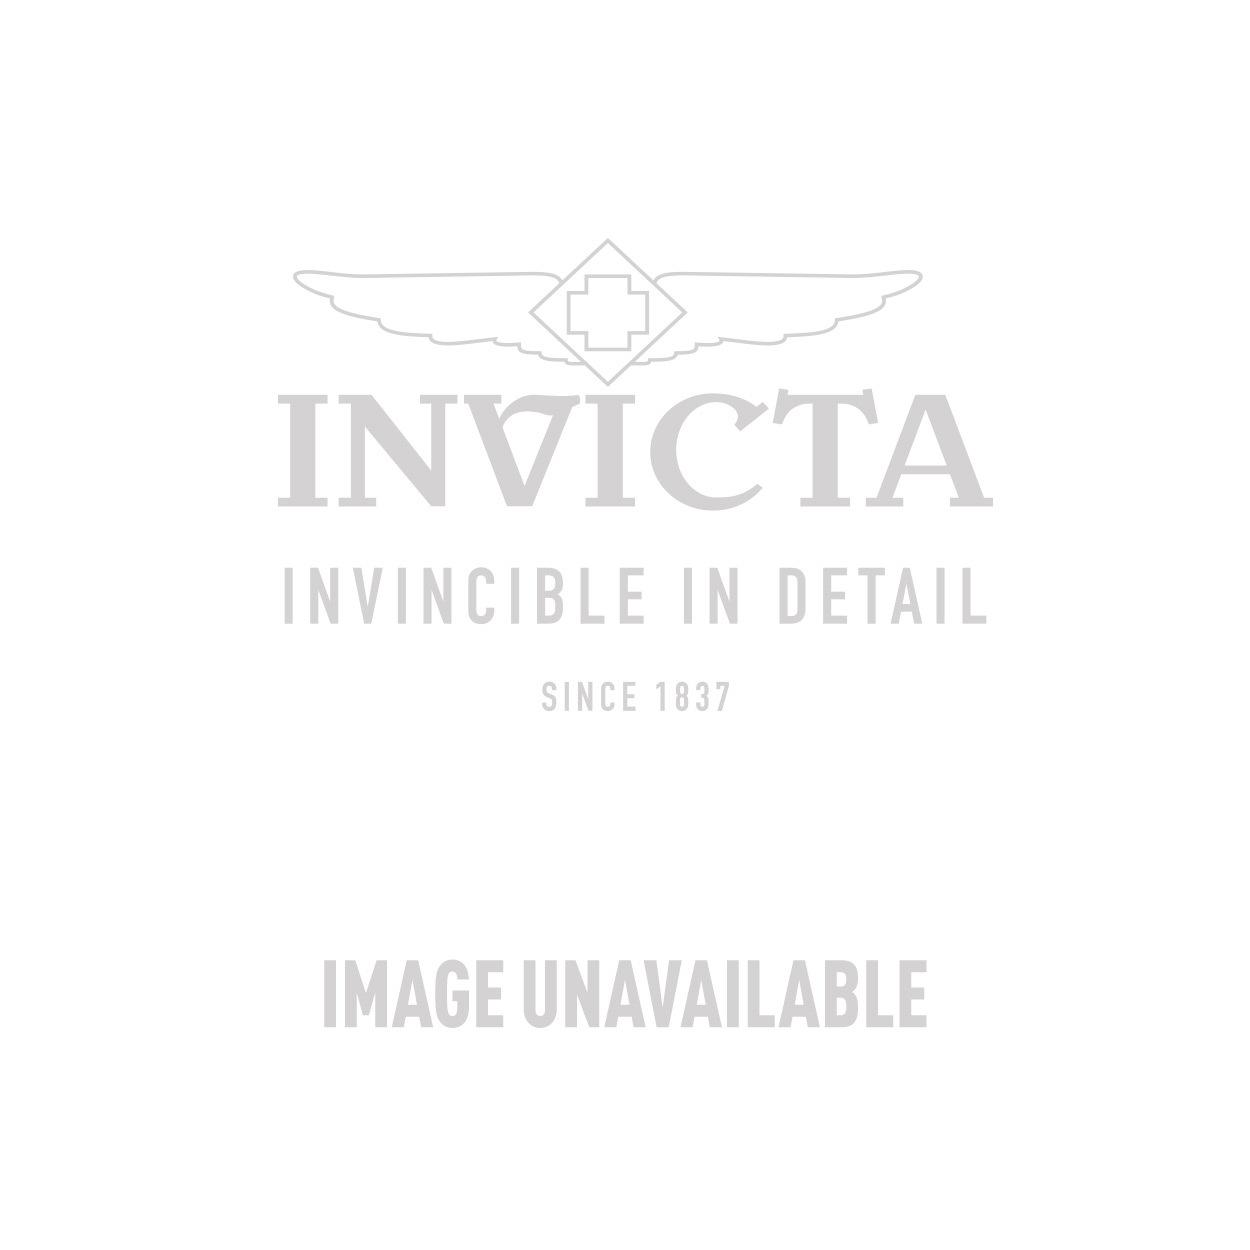 Invicta Corduba Swiss Movement Quartz Watch - Stainless Steel case with Black tone Polyurethane band - Model 18831